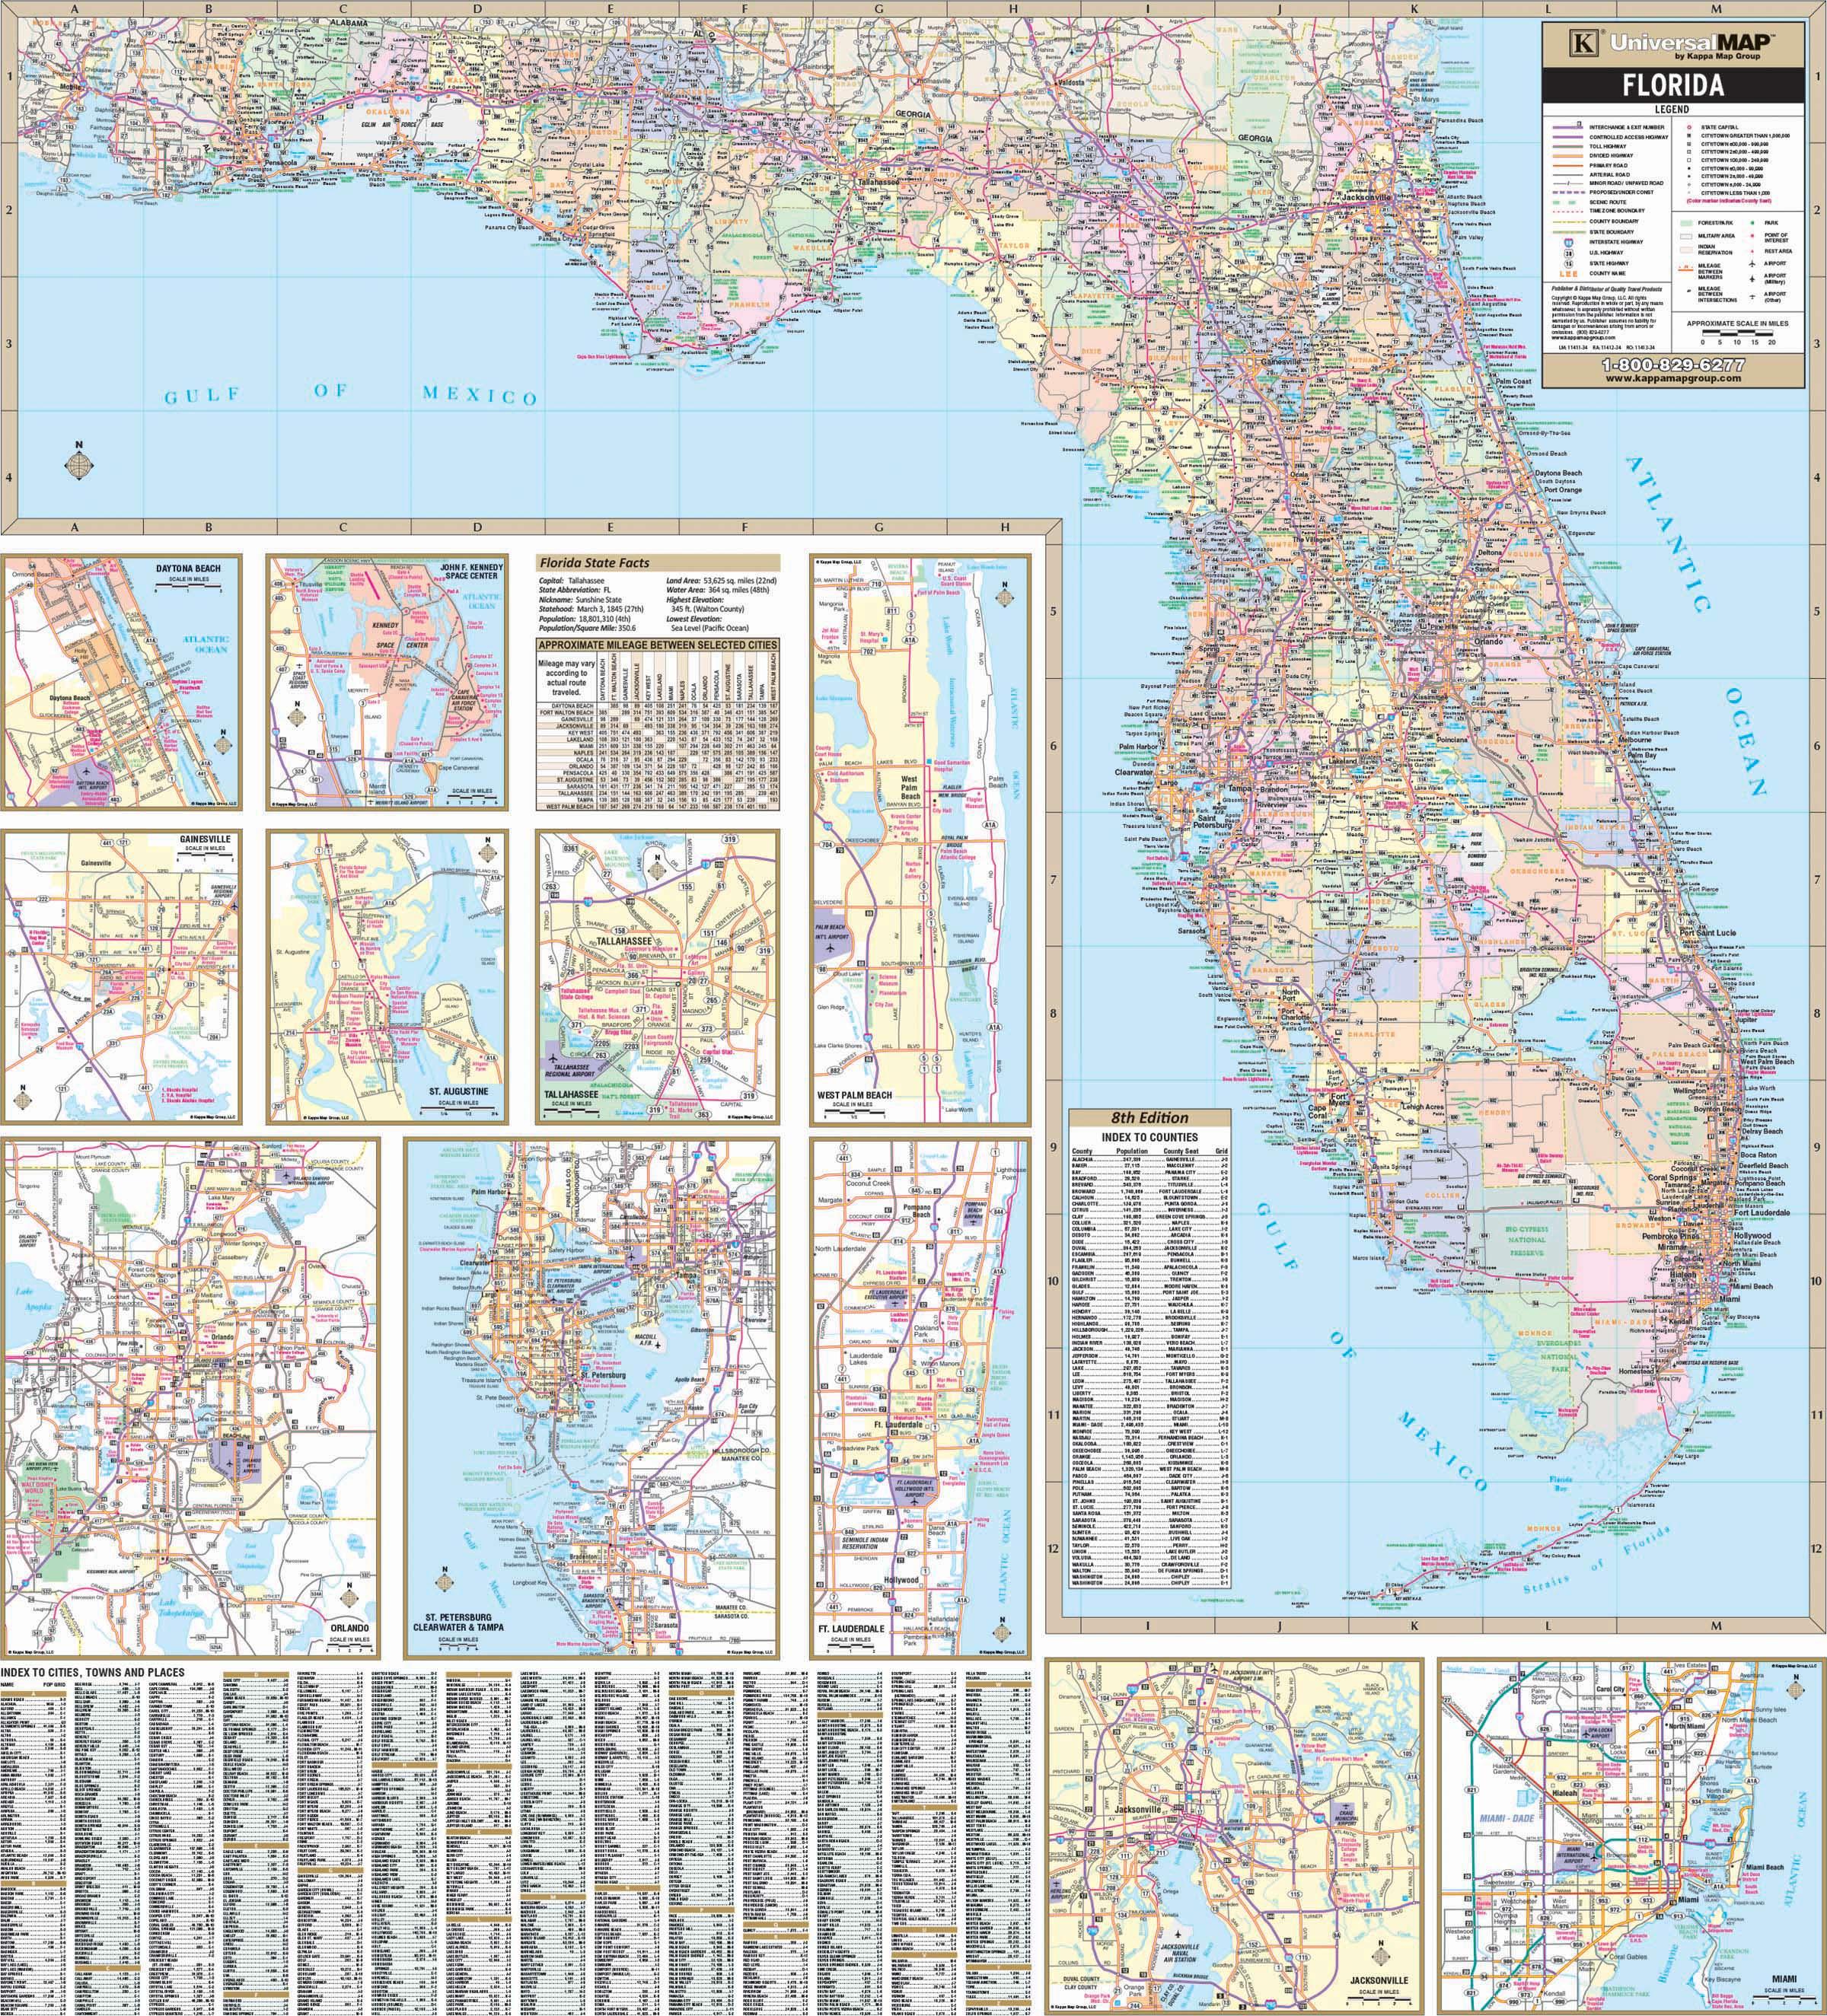 Florida State Wall Map – Kappa Map Group - Florida Wall Map